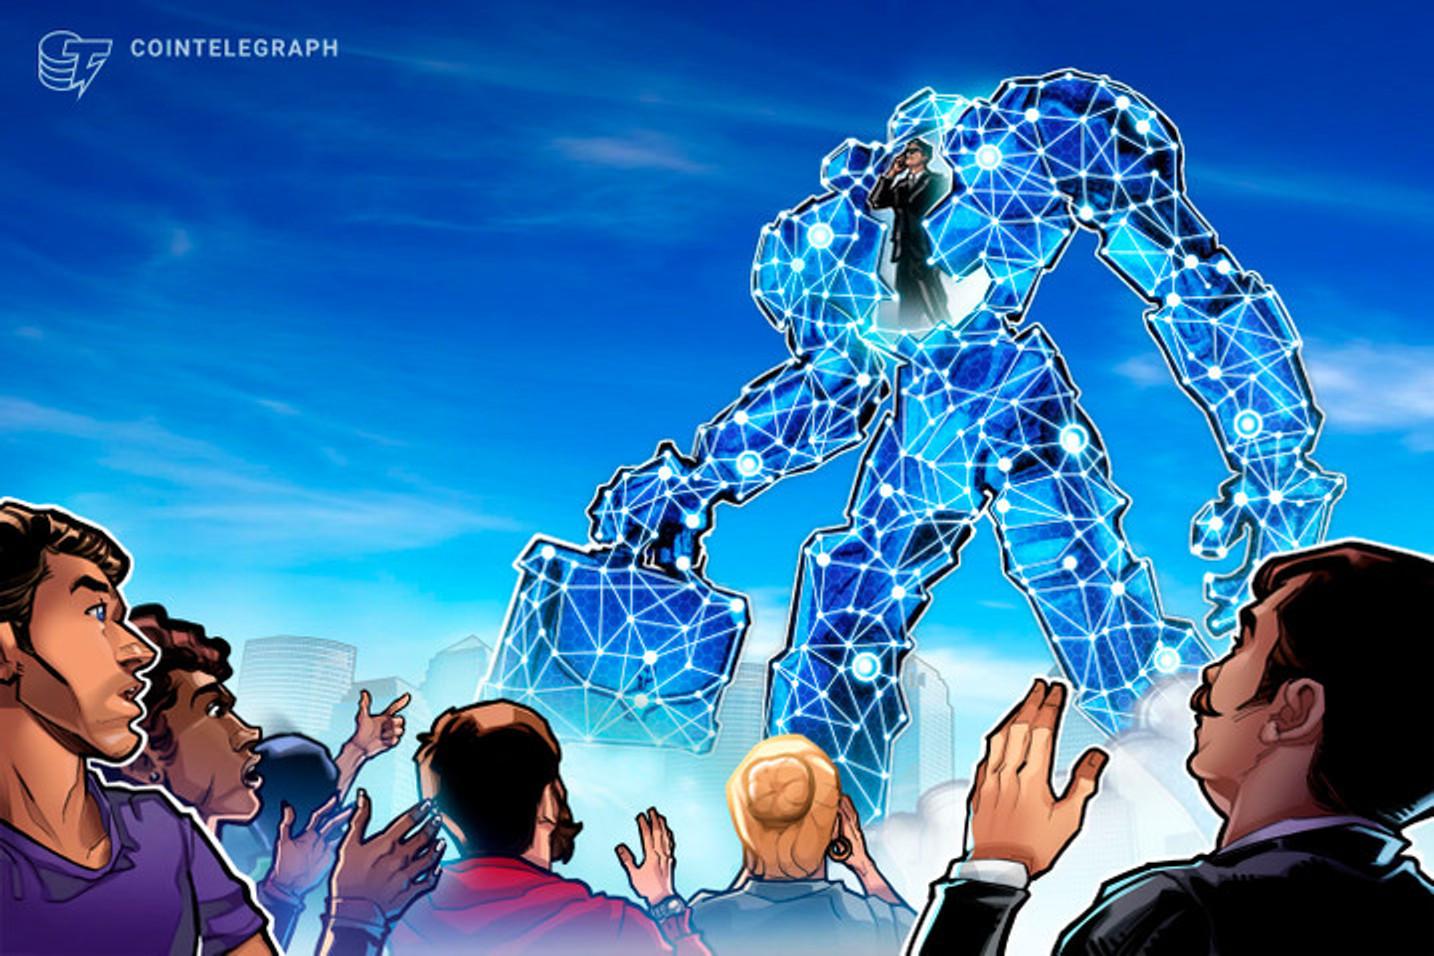 Dados mostram que hashrate do Bitcoin segue crescendo e bate novo recorde